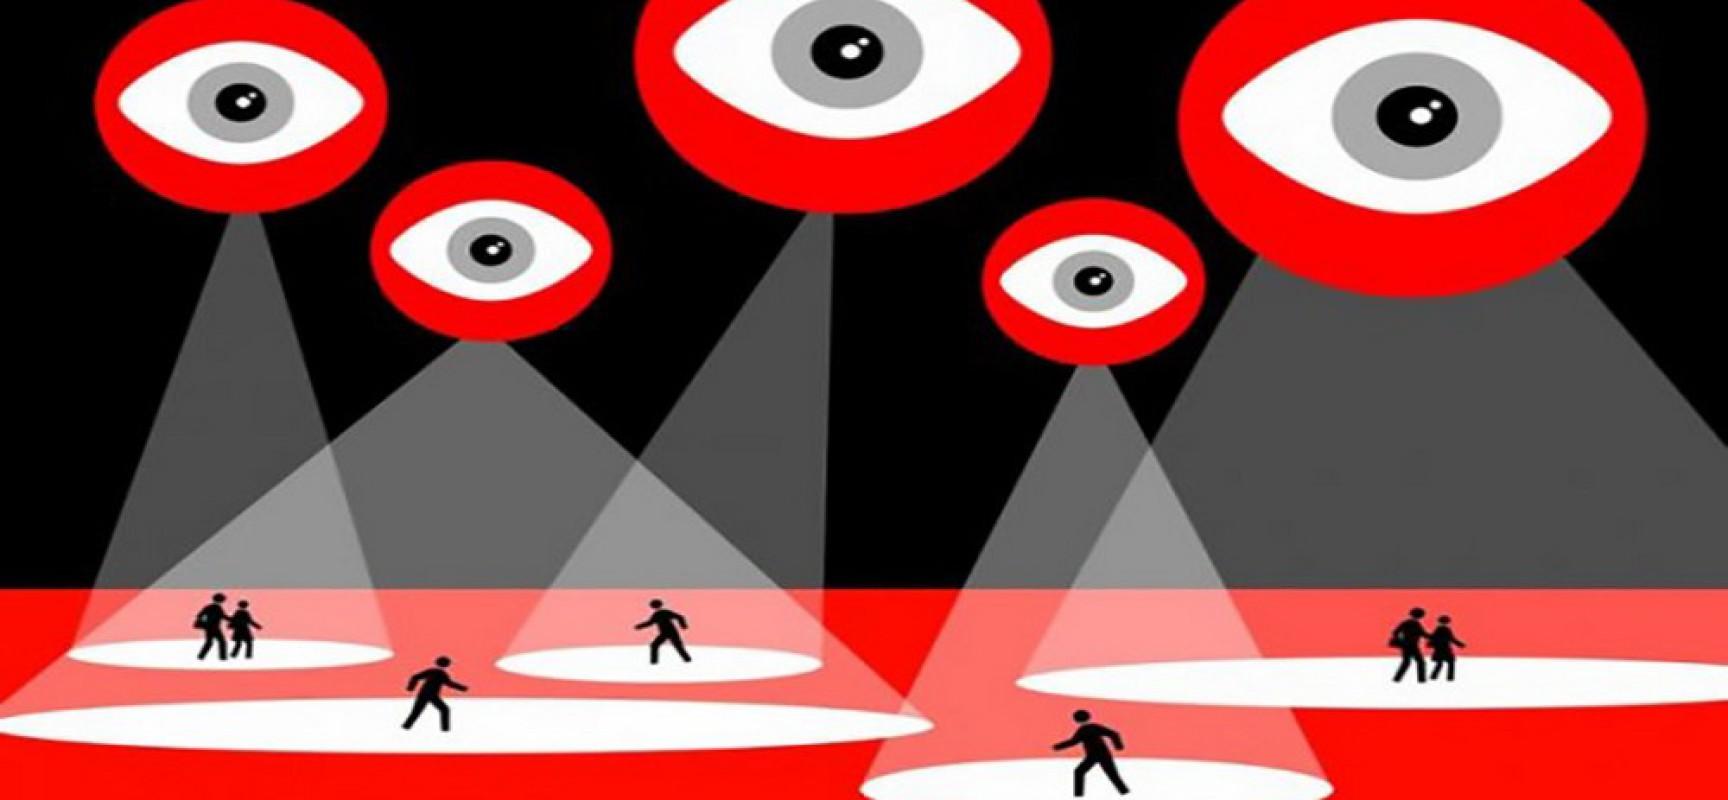 GenerationLibre attaque le fichier TES devant l'UE